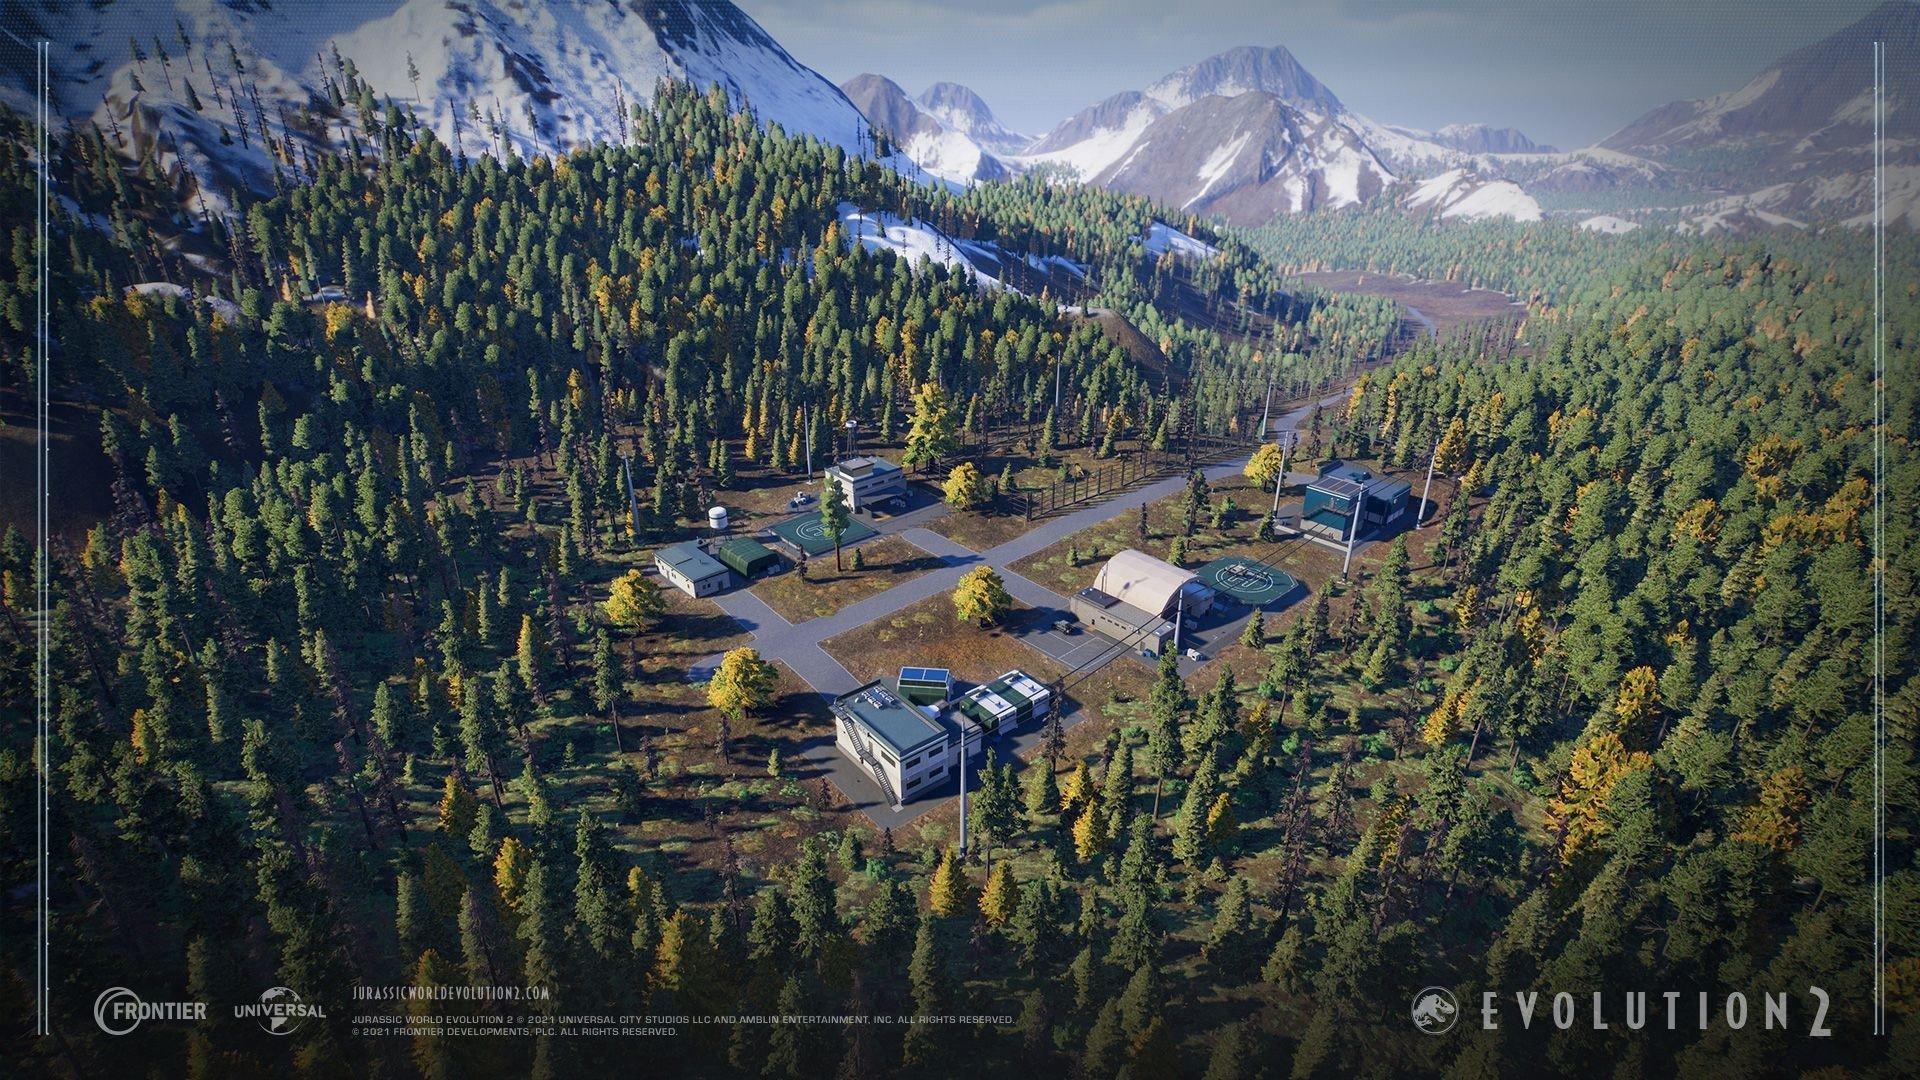 Jurassic-World-Evolution-2-Screenshot-Announcement-Summer-Game-Fest-2021-3